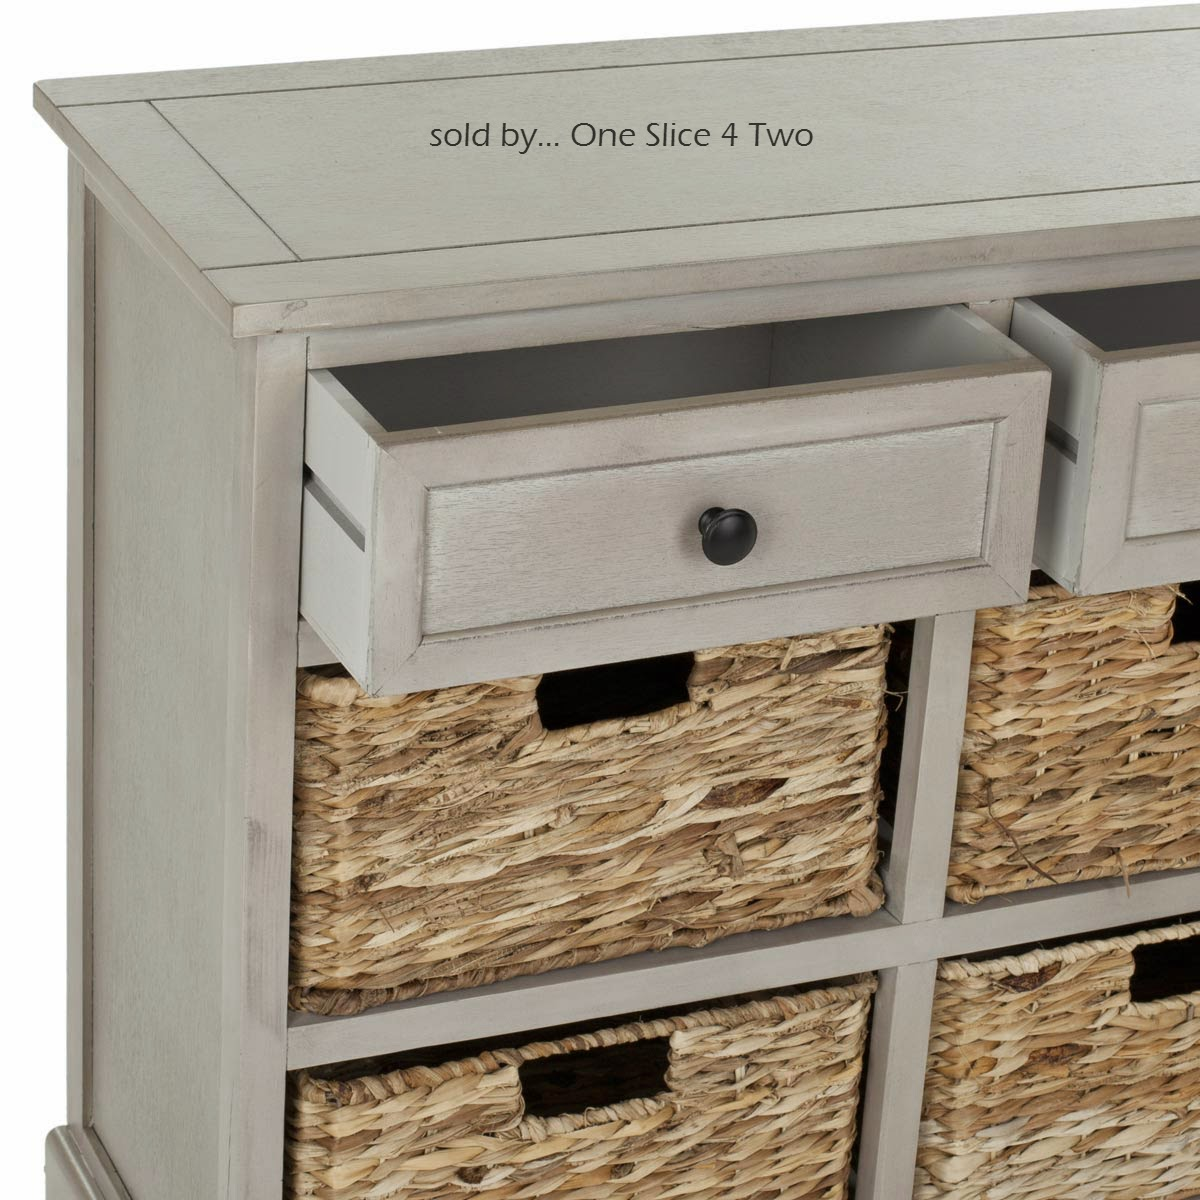 Herman 6 Drawer Storage Unit In Vintage Grey Color One Slice 4 Two